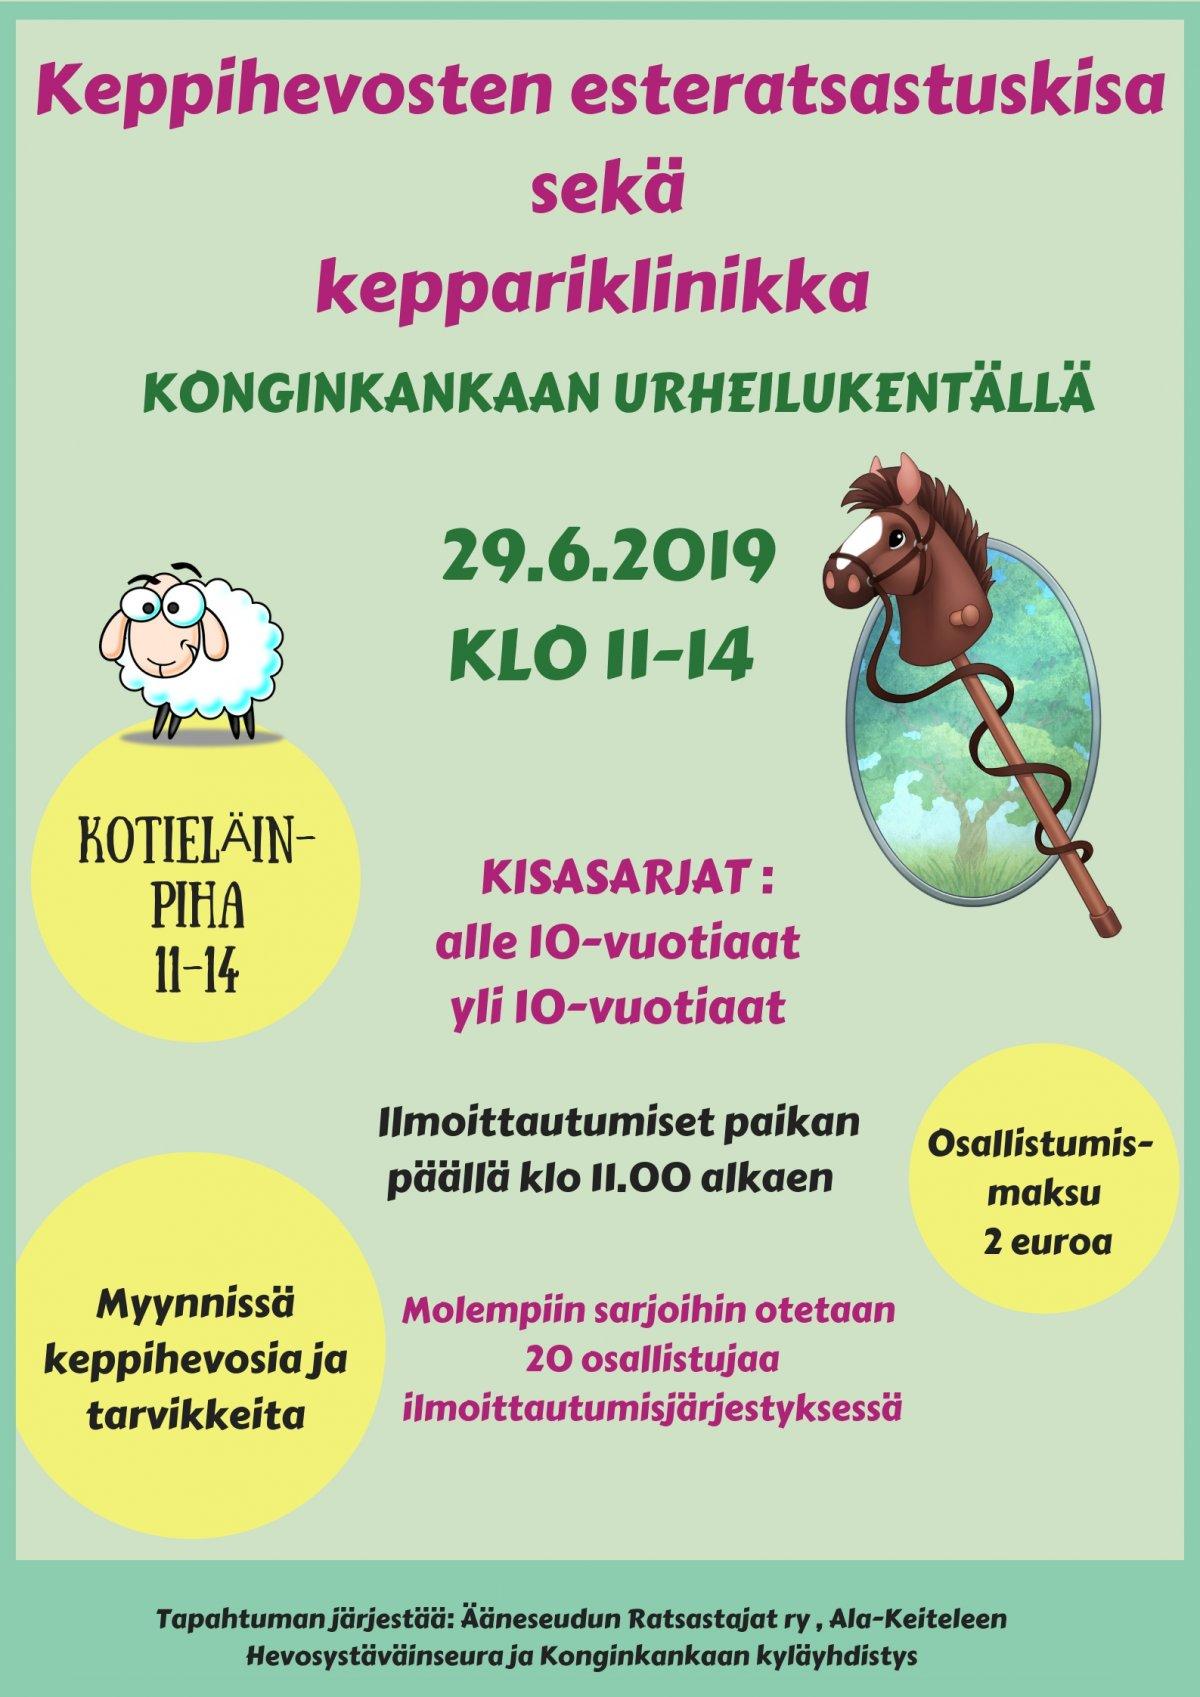 To 12.9.2019 klo 12.15-13.30 Liikuntaluoviskerho 3.-4.